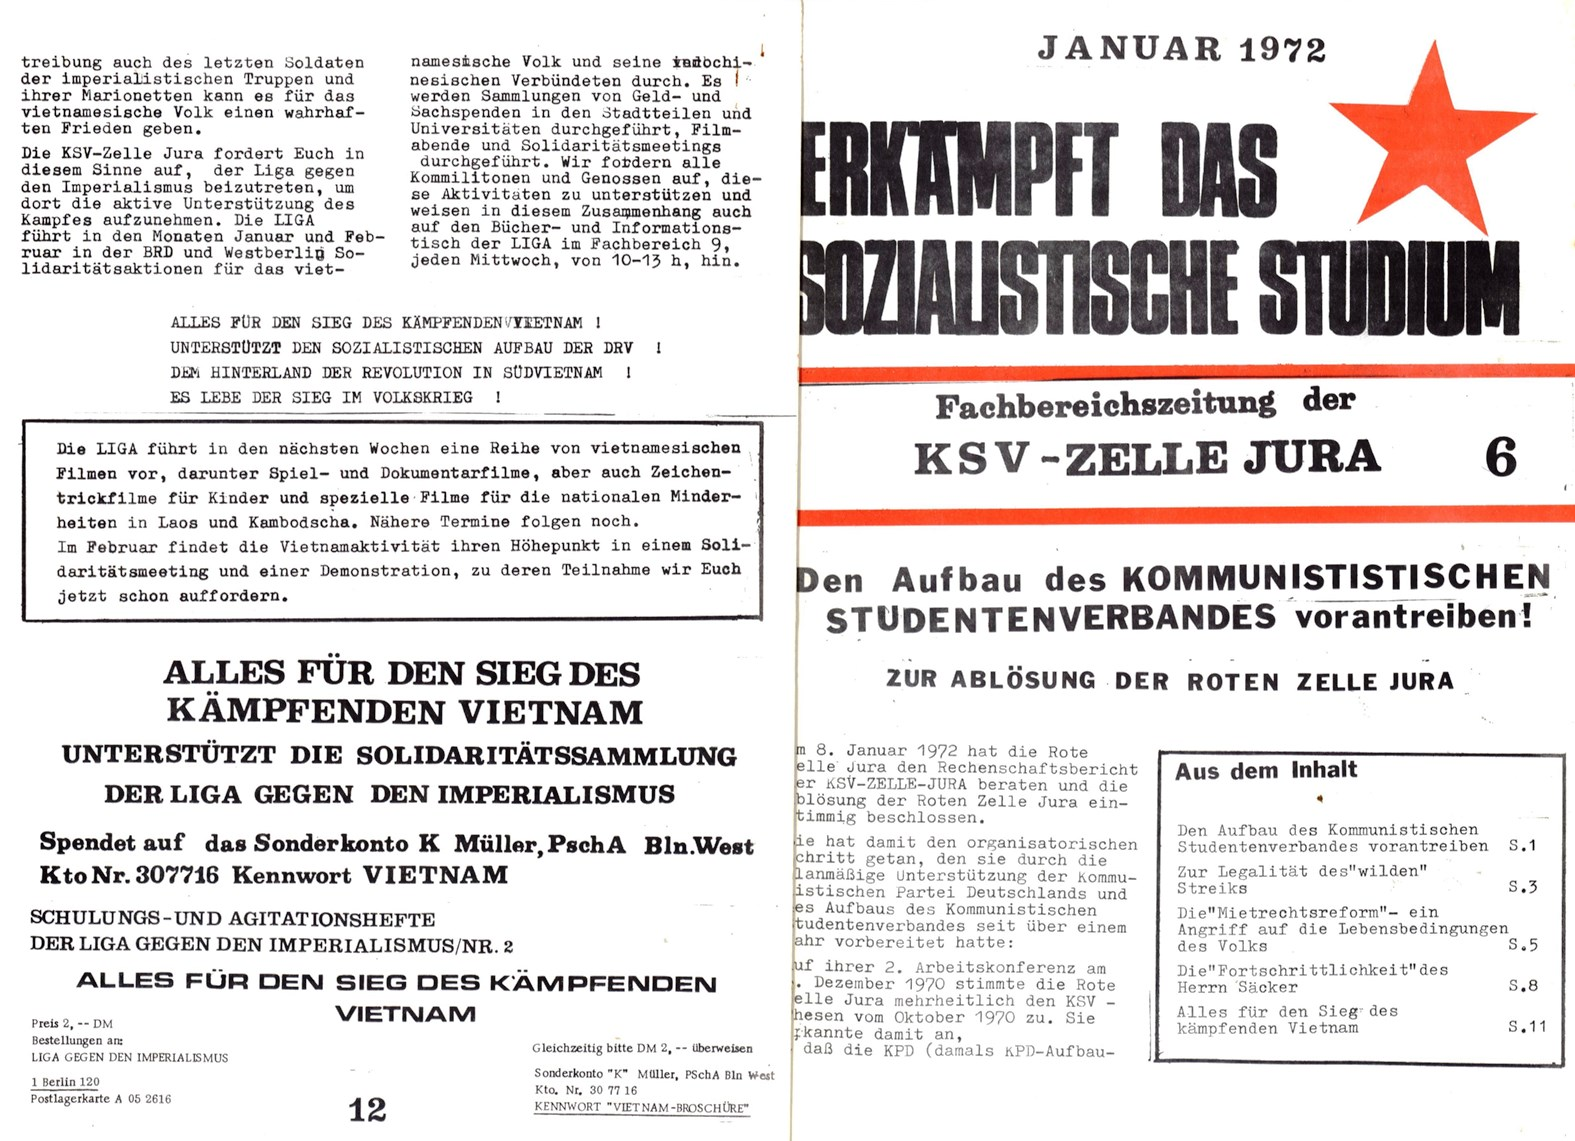 Berlin_KSV_Jura_Studentenpresse_19720115_06_01